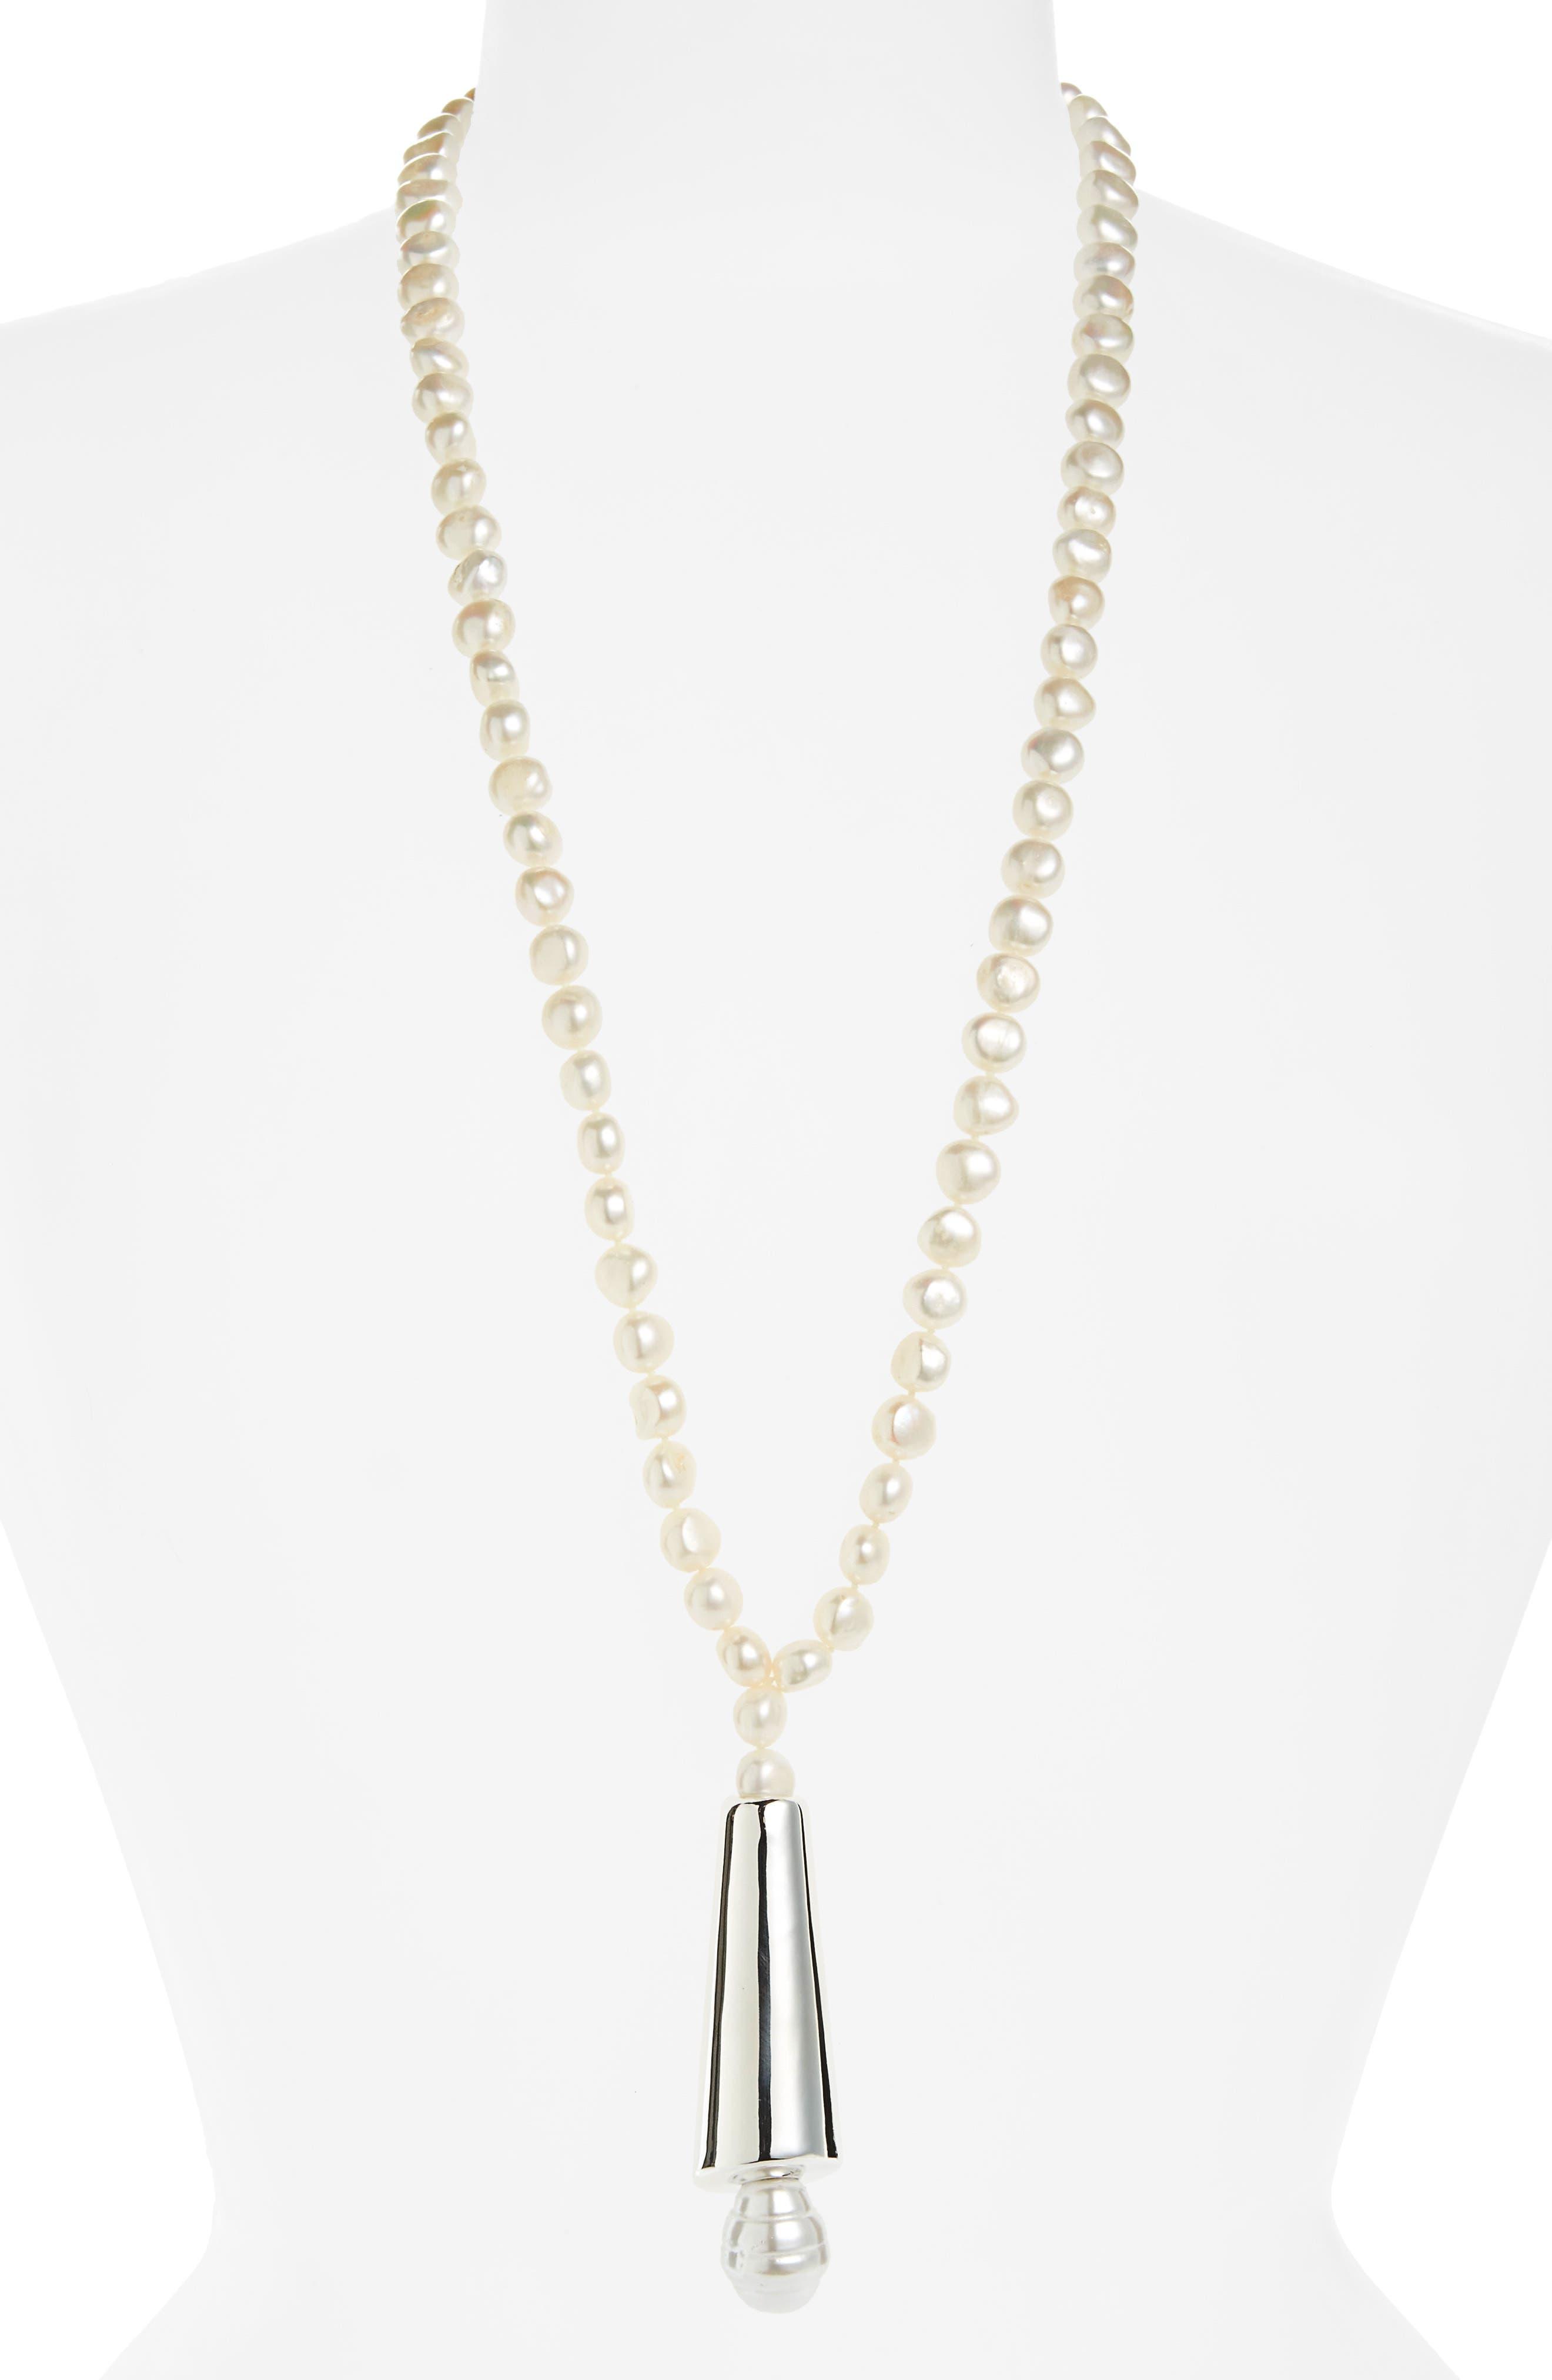 Semiprecious Stone Strand Necklace,                             Main thumbnail 1, color,                             Peach/ Silver